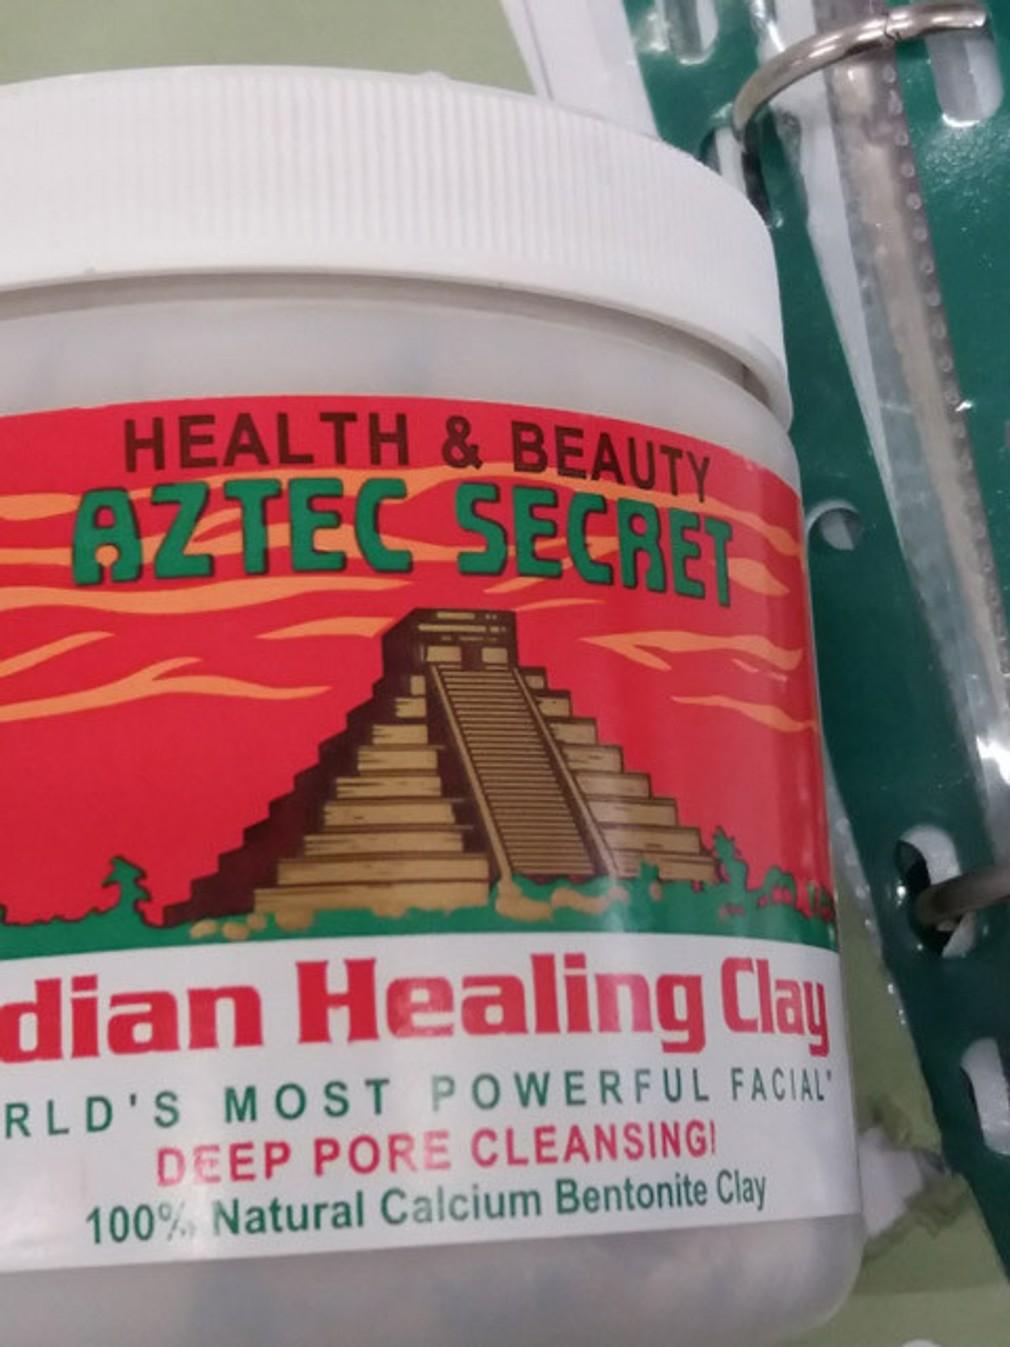 Indian Healing Clay a je značky Aztec Secret Health and Beauty